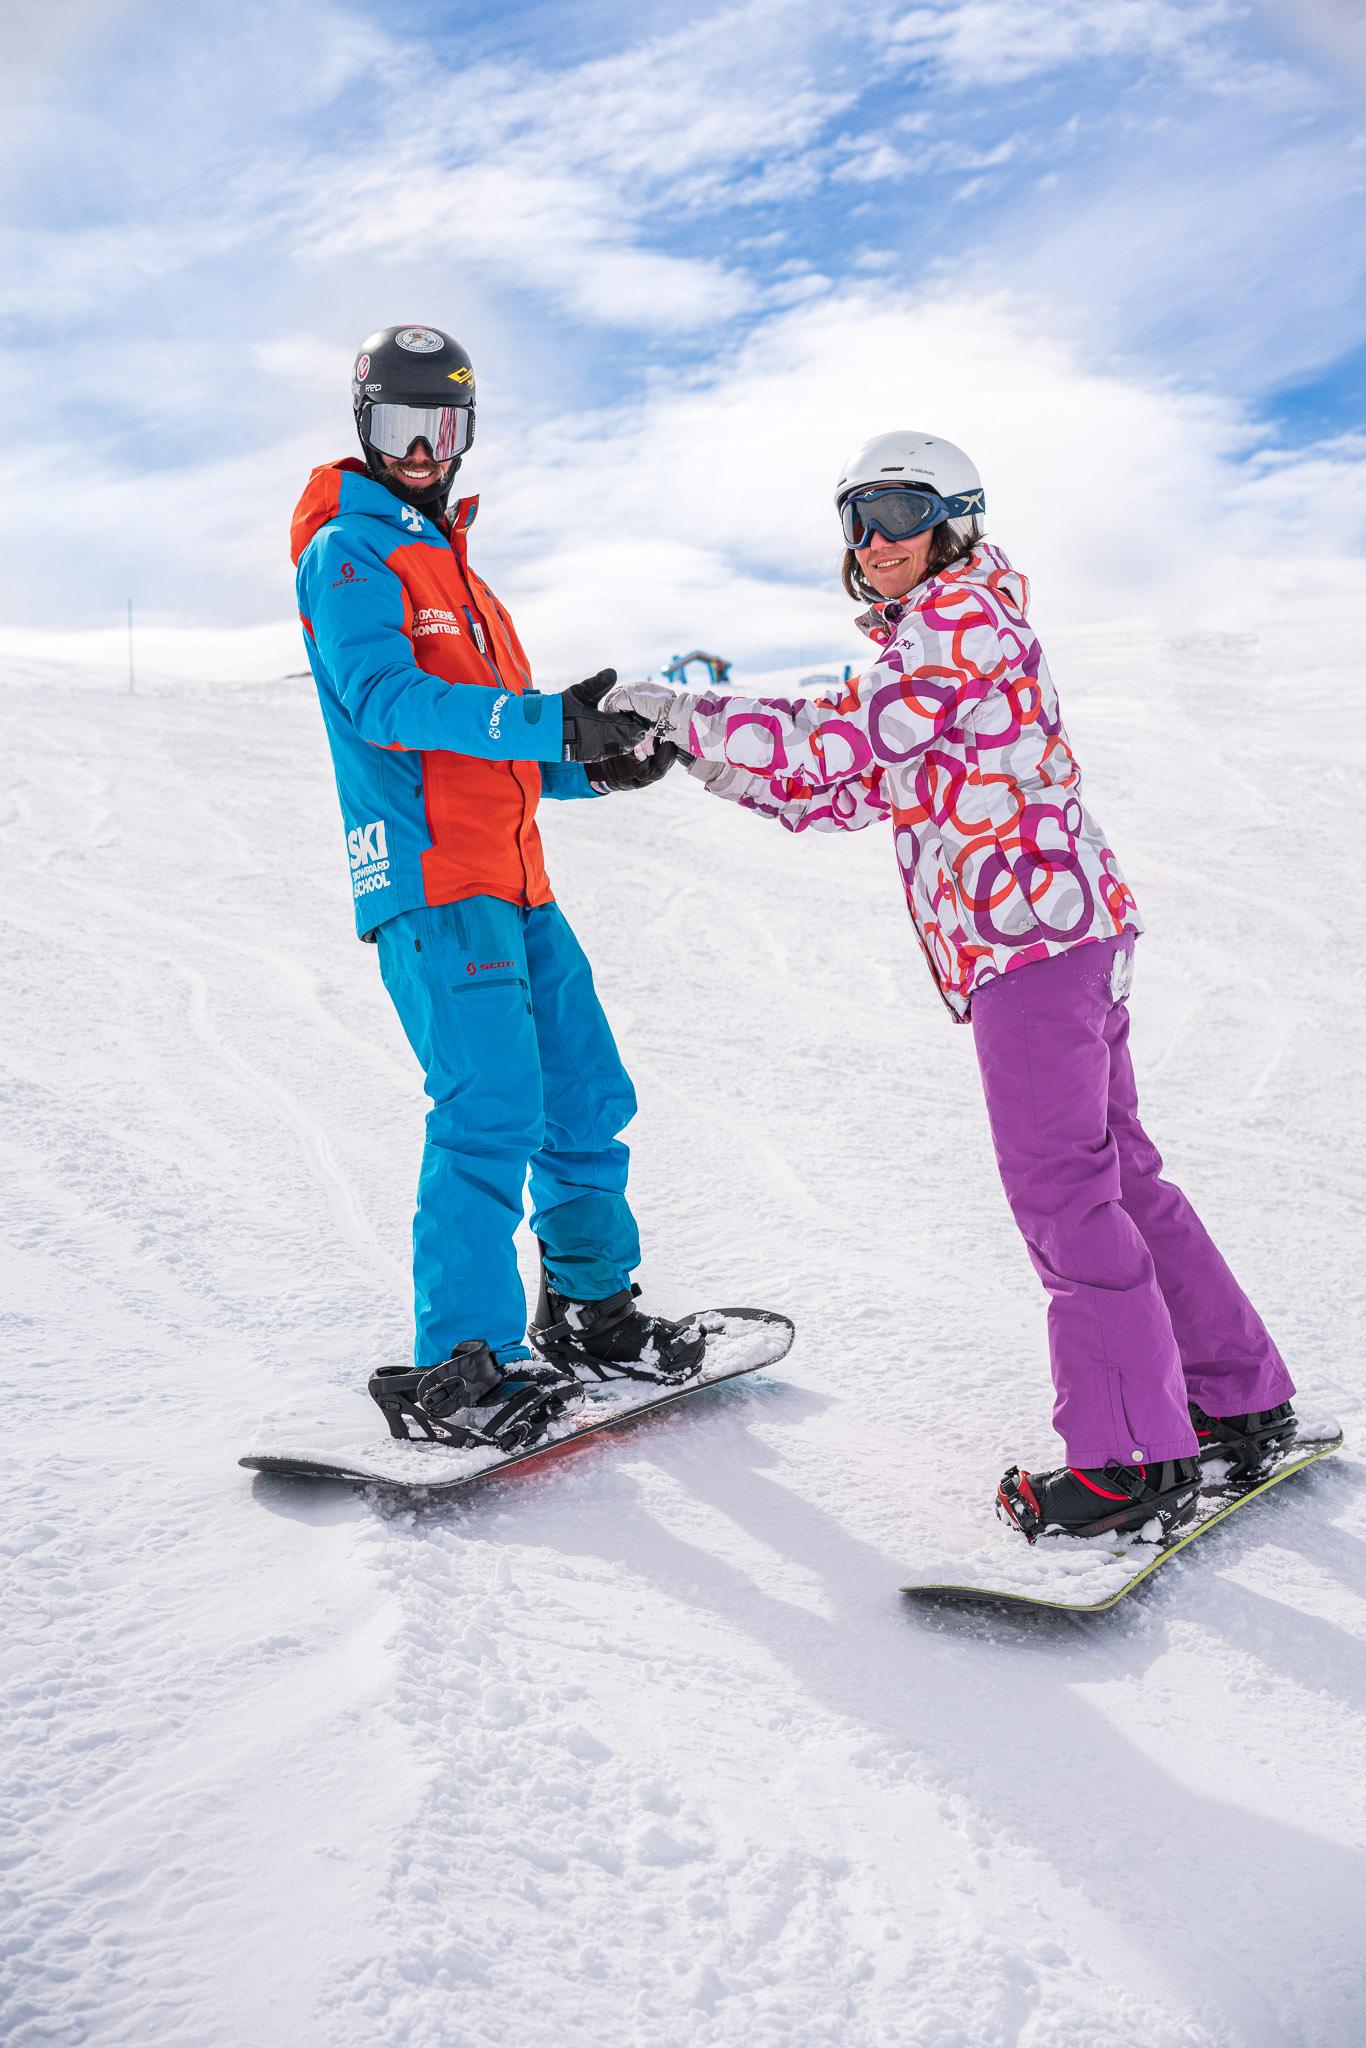 Oxygene snowboard lessons